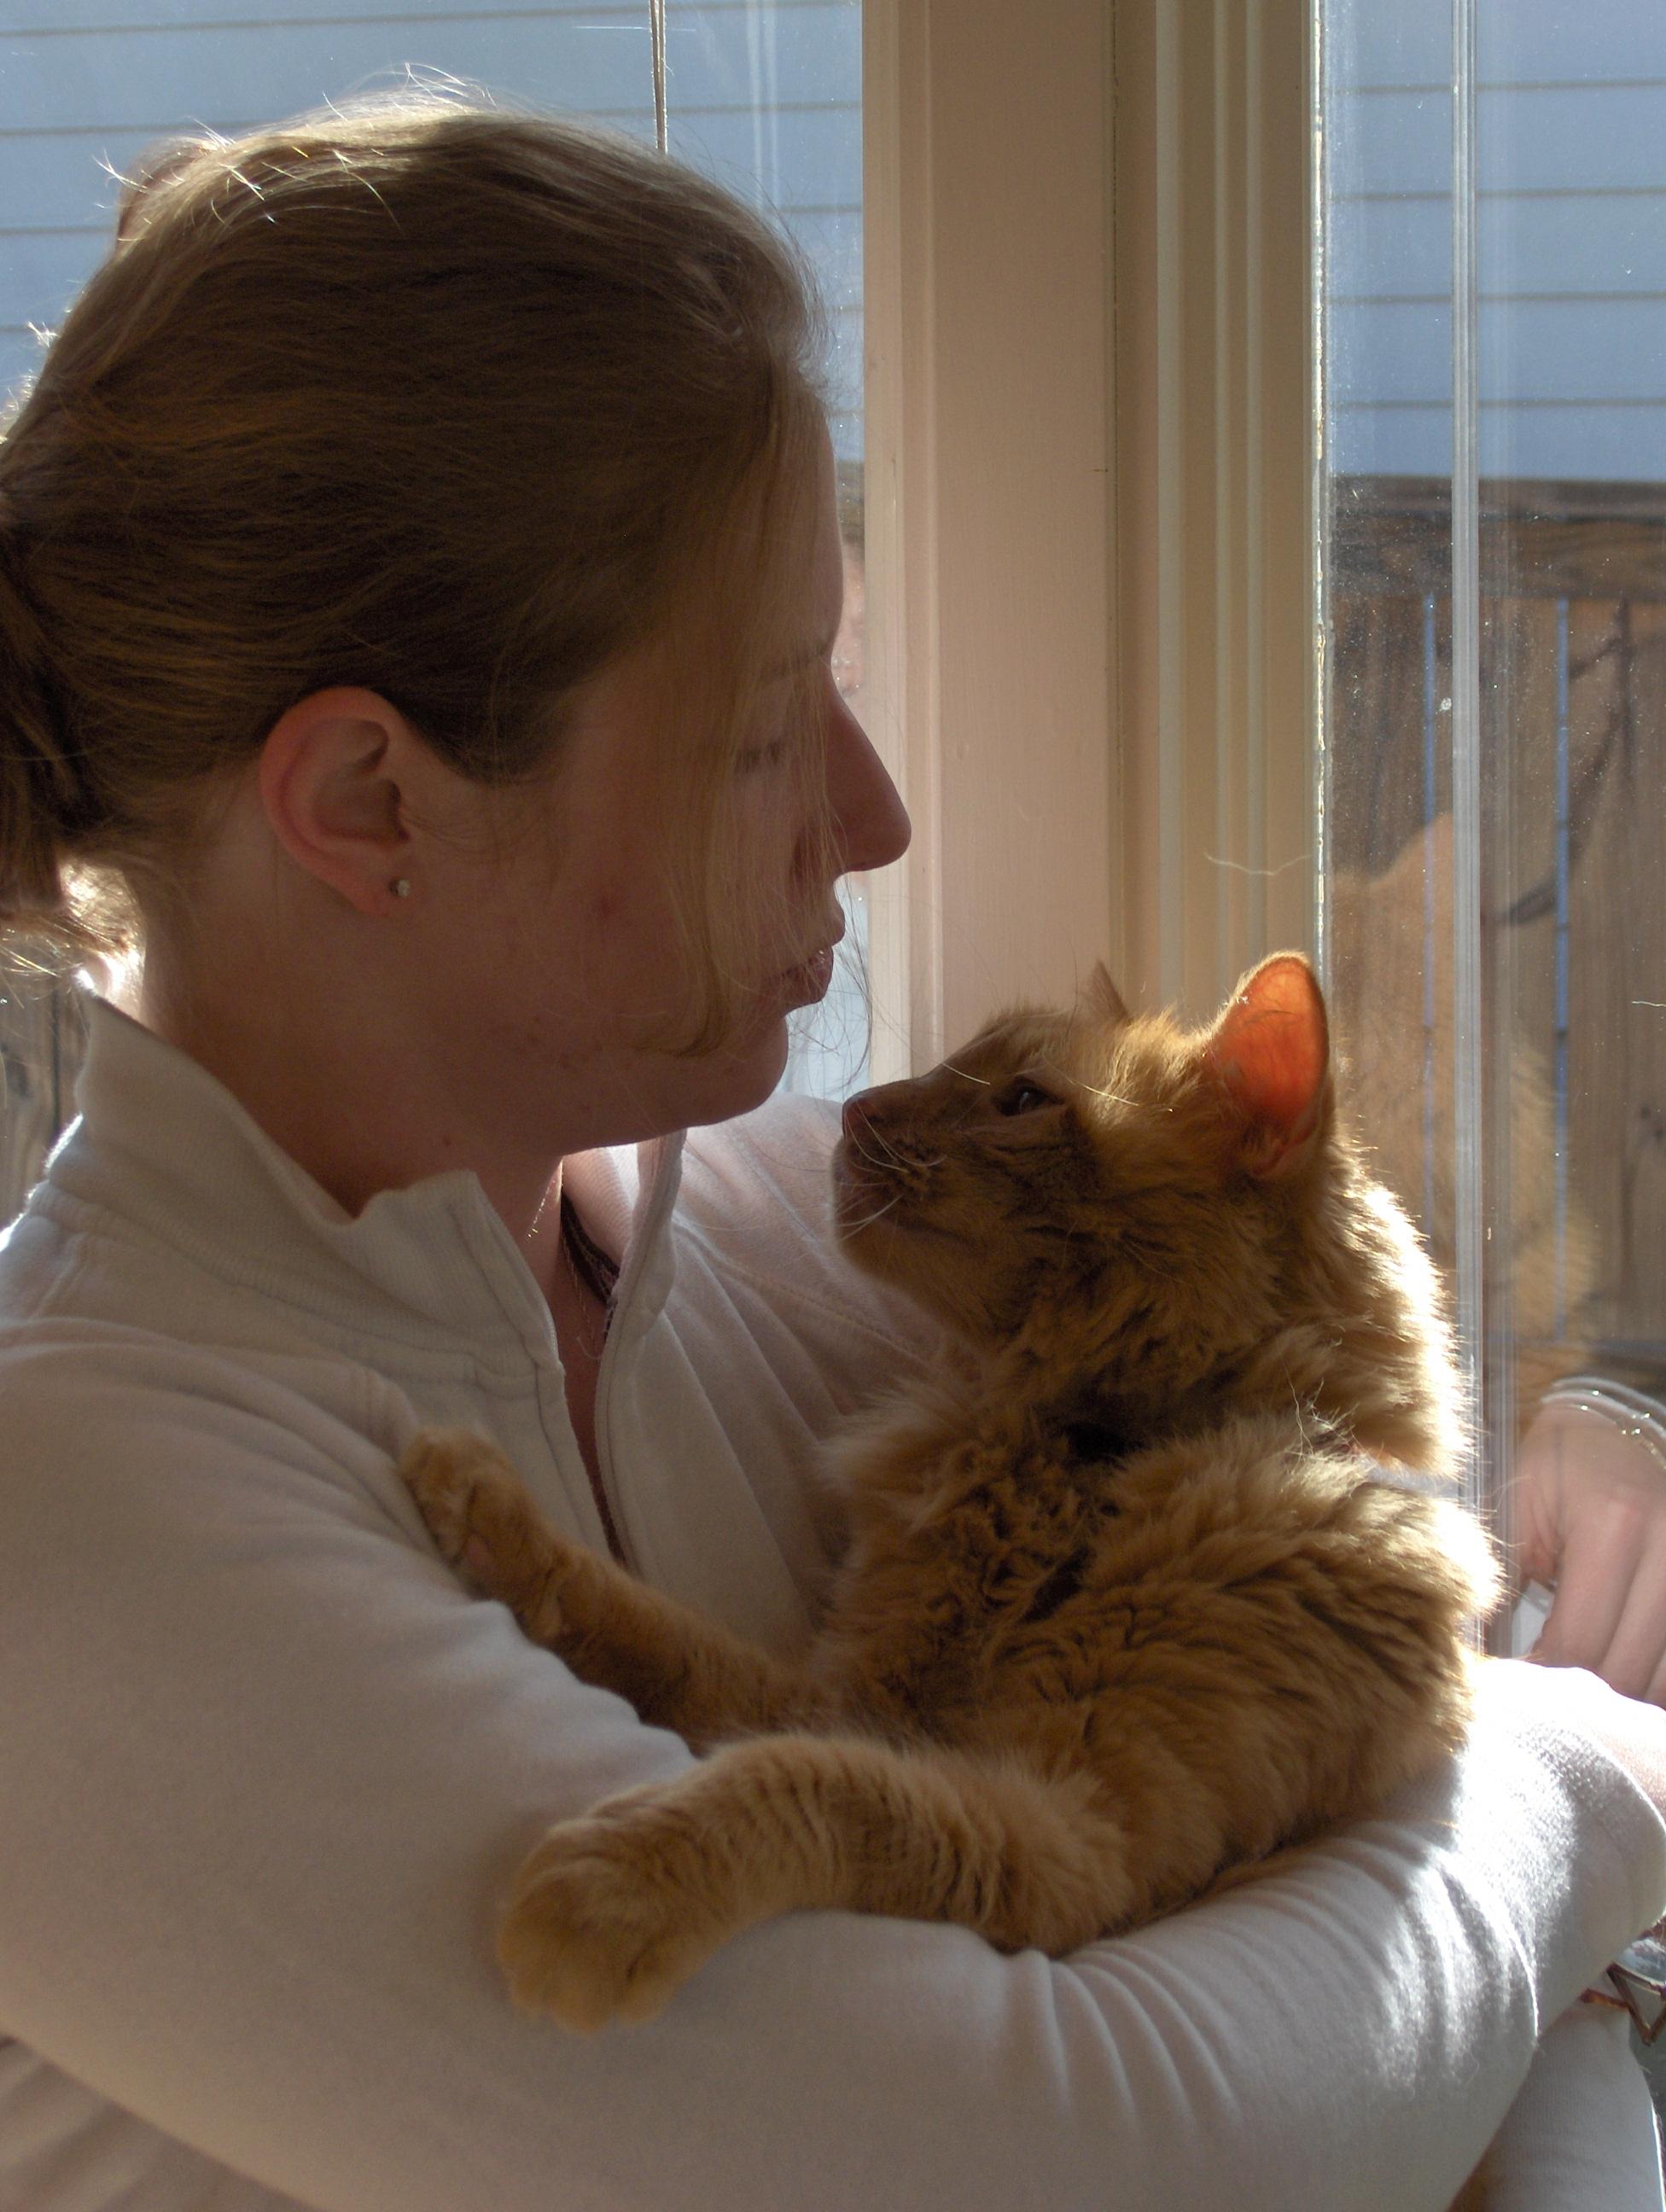 trianglevrh-triangle-veterinary-referral-hospital-tvrh-woman-holding-orange-cat.JPG